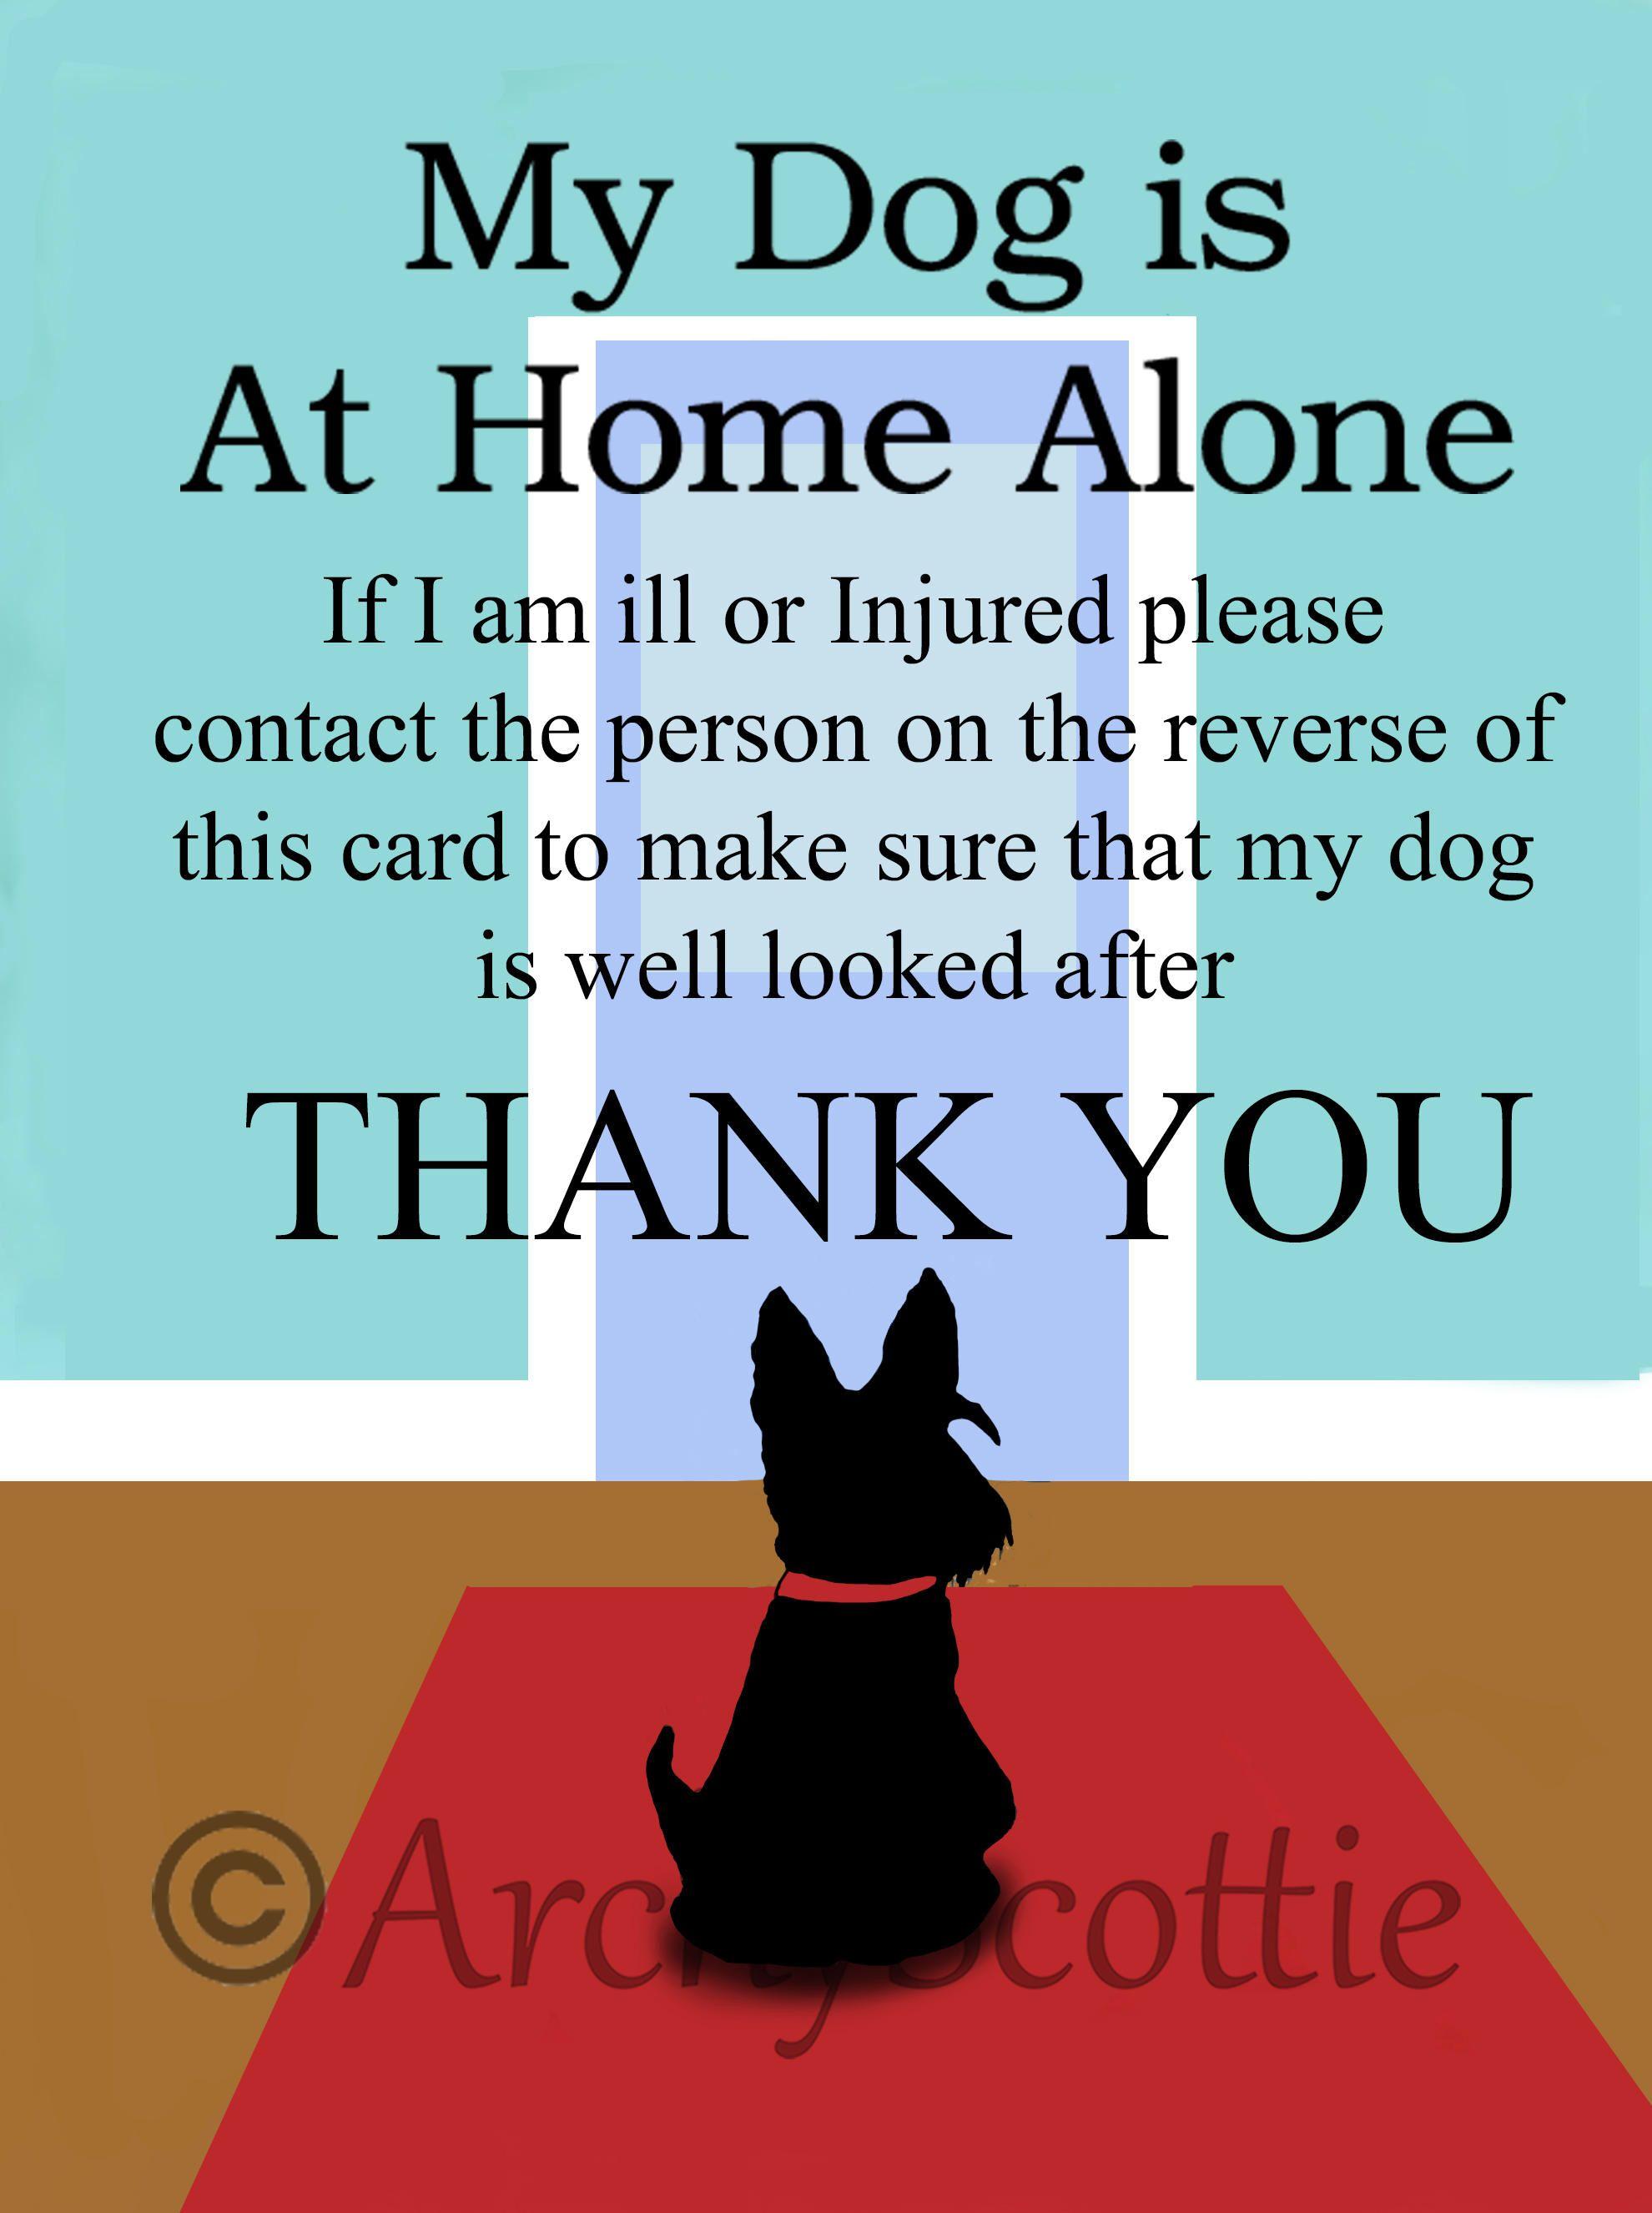 Scottie Dog Pet Alert Emergency Cards Wallet Size 4 Cards Home Etsy Scottie Dog Cheap Dog Toys Pet Dogs